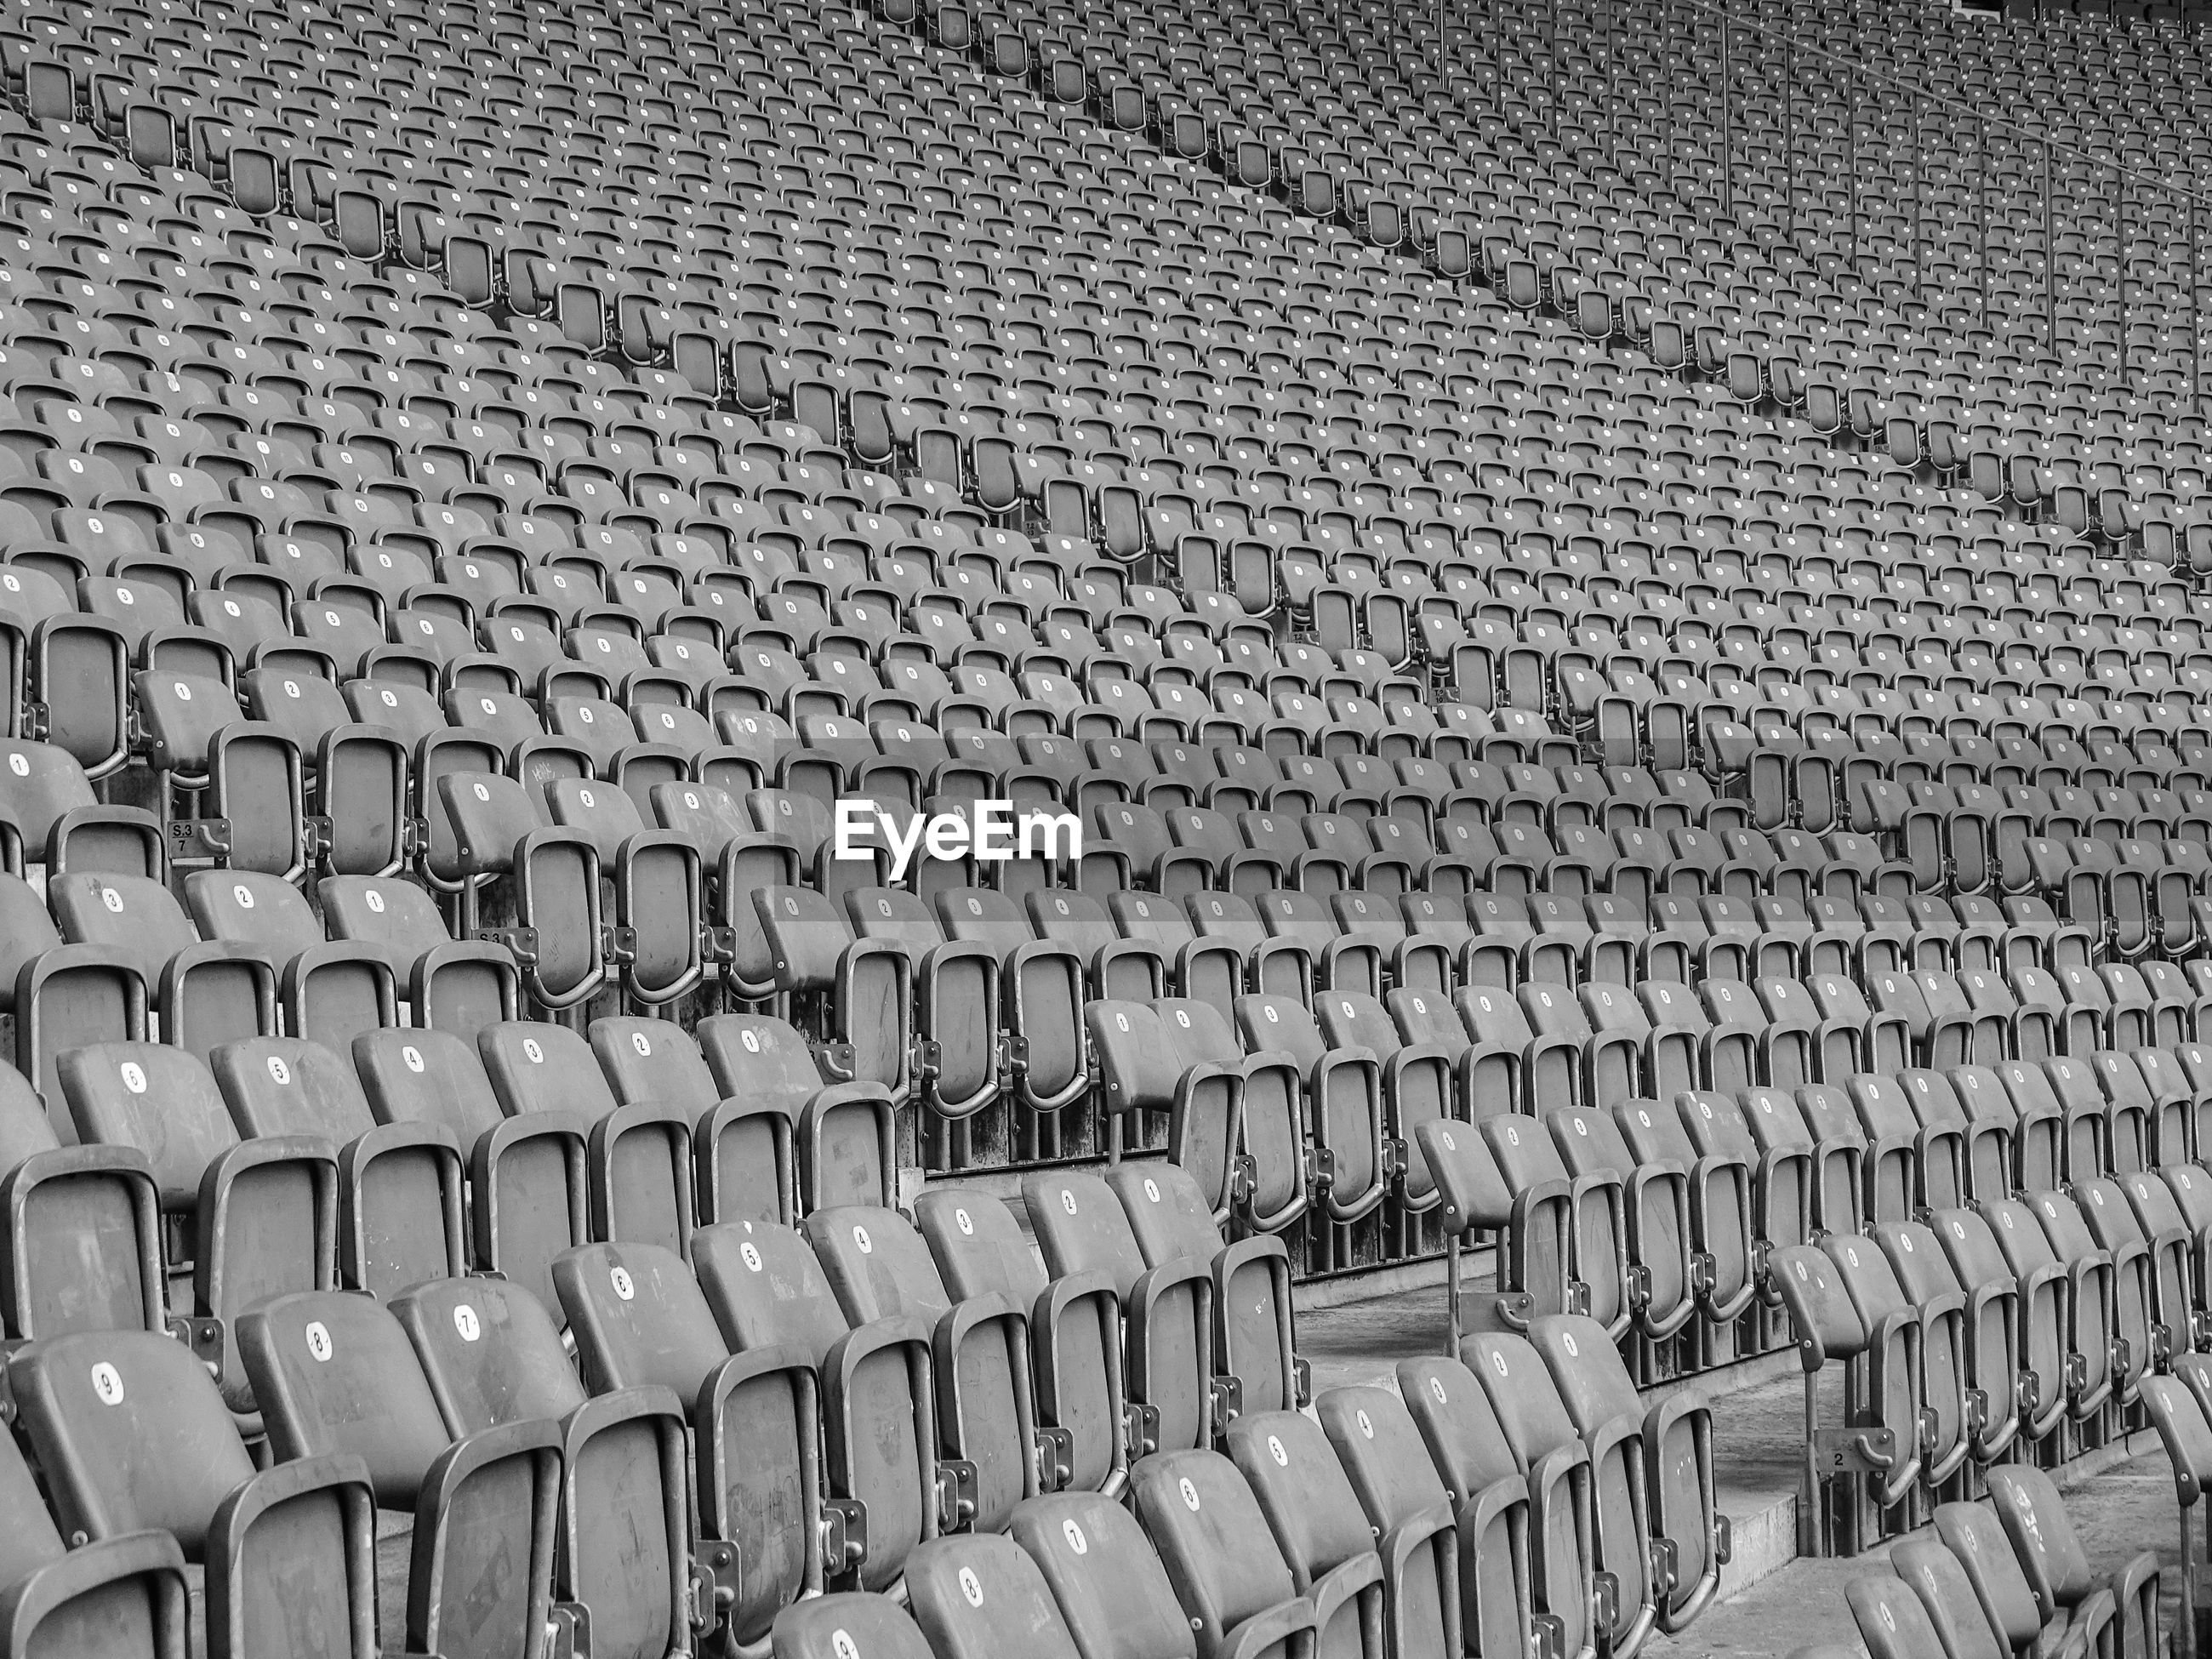 Shot of empty bleachers at stadium